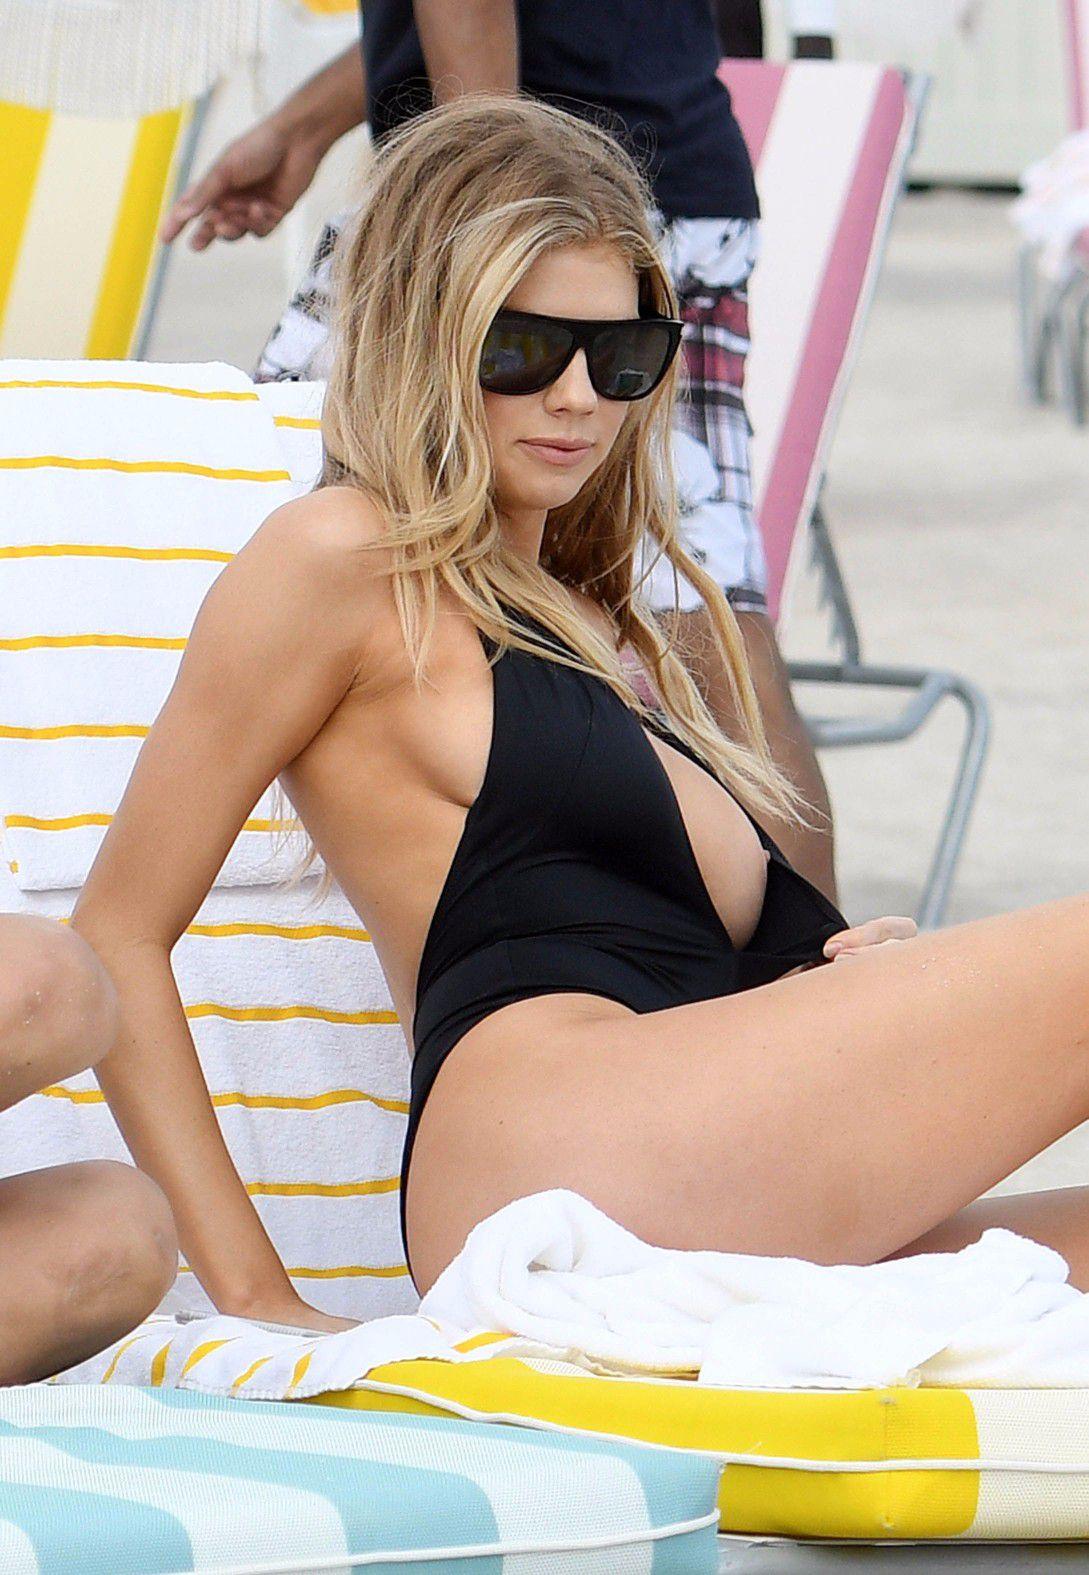 charlotte-mckinney-nipple-slip-at-the-beach-in-miami-22